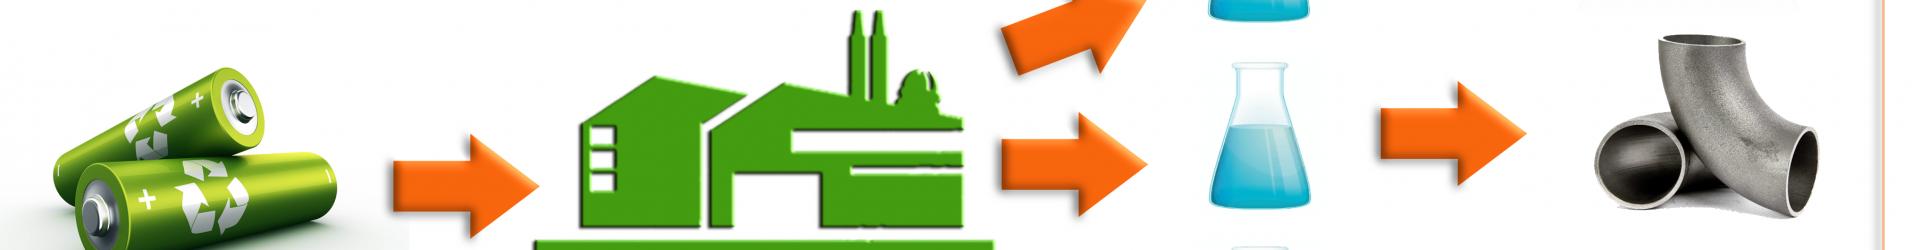 Бизнес идея: Утилизация батареек